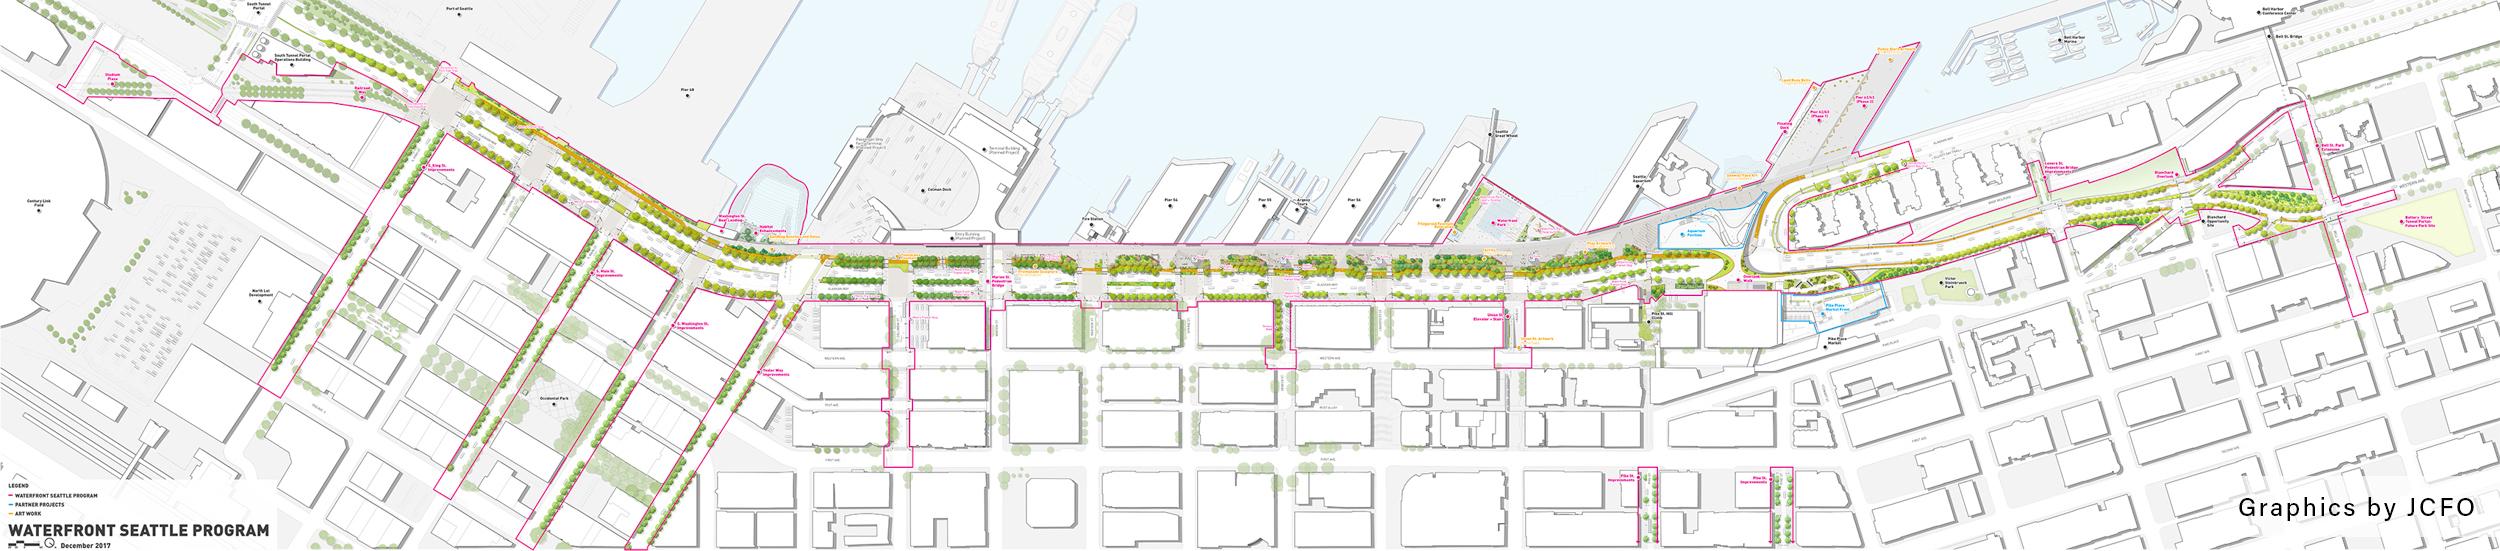 Seattle Waterfront Plan